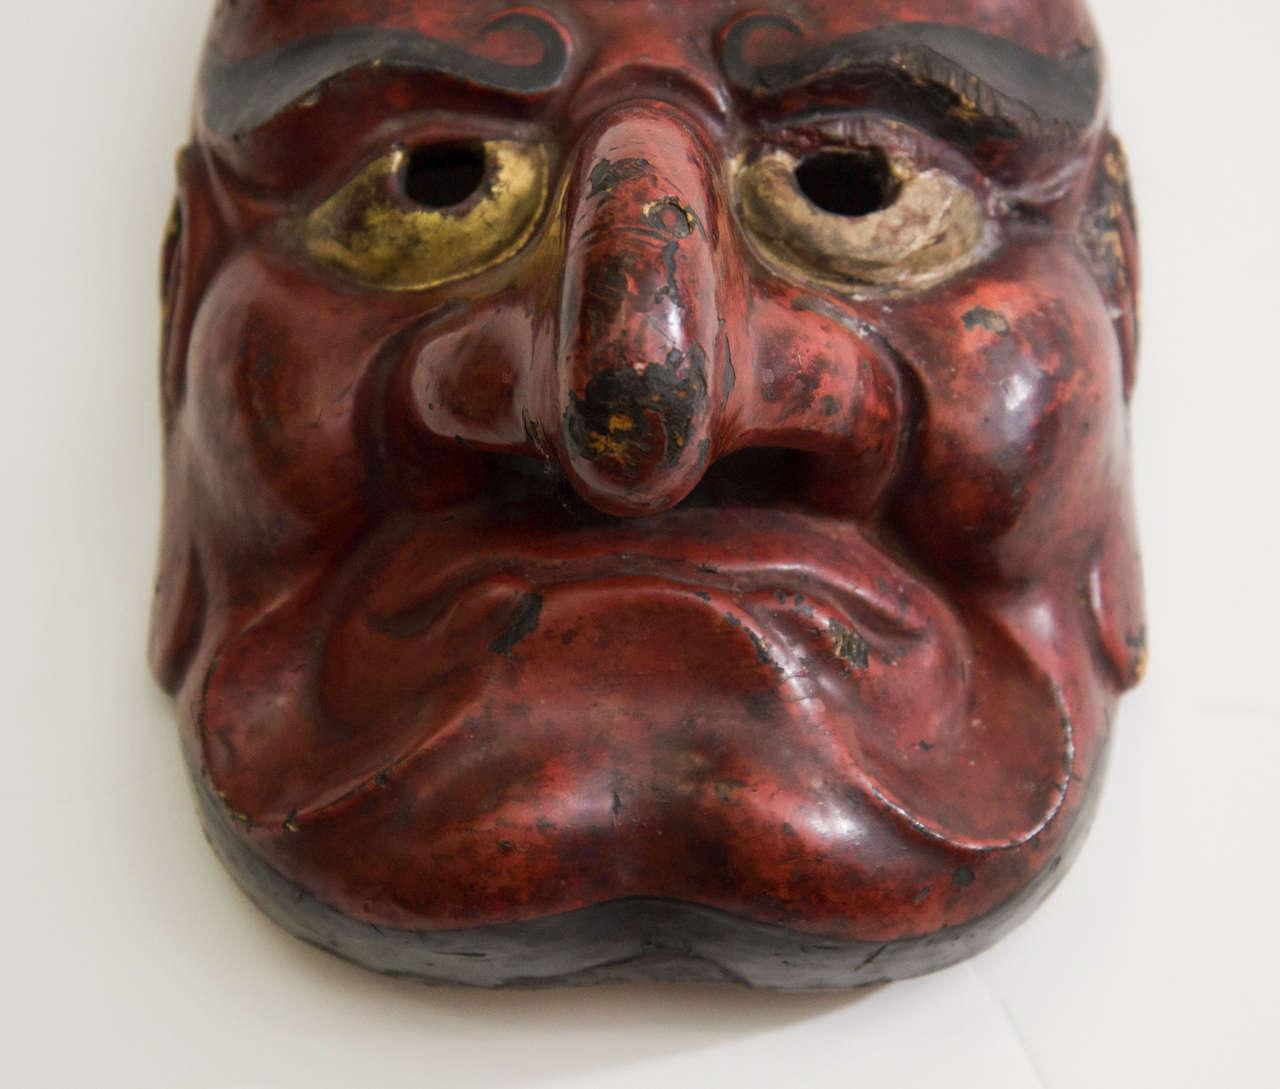 19th Century Edo Period Japanese Comic Demon Buaku Kyogen Mask For Sale